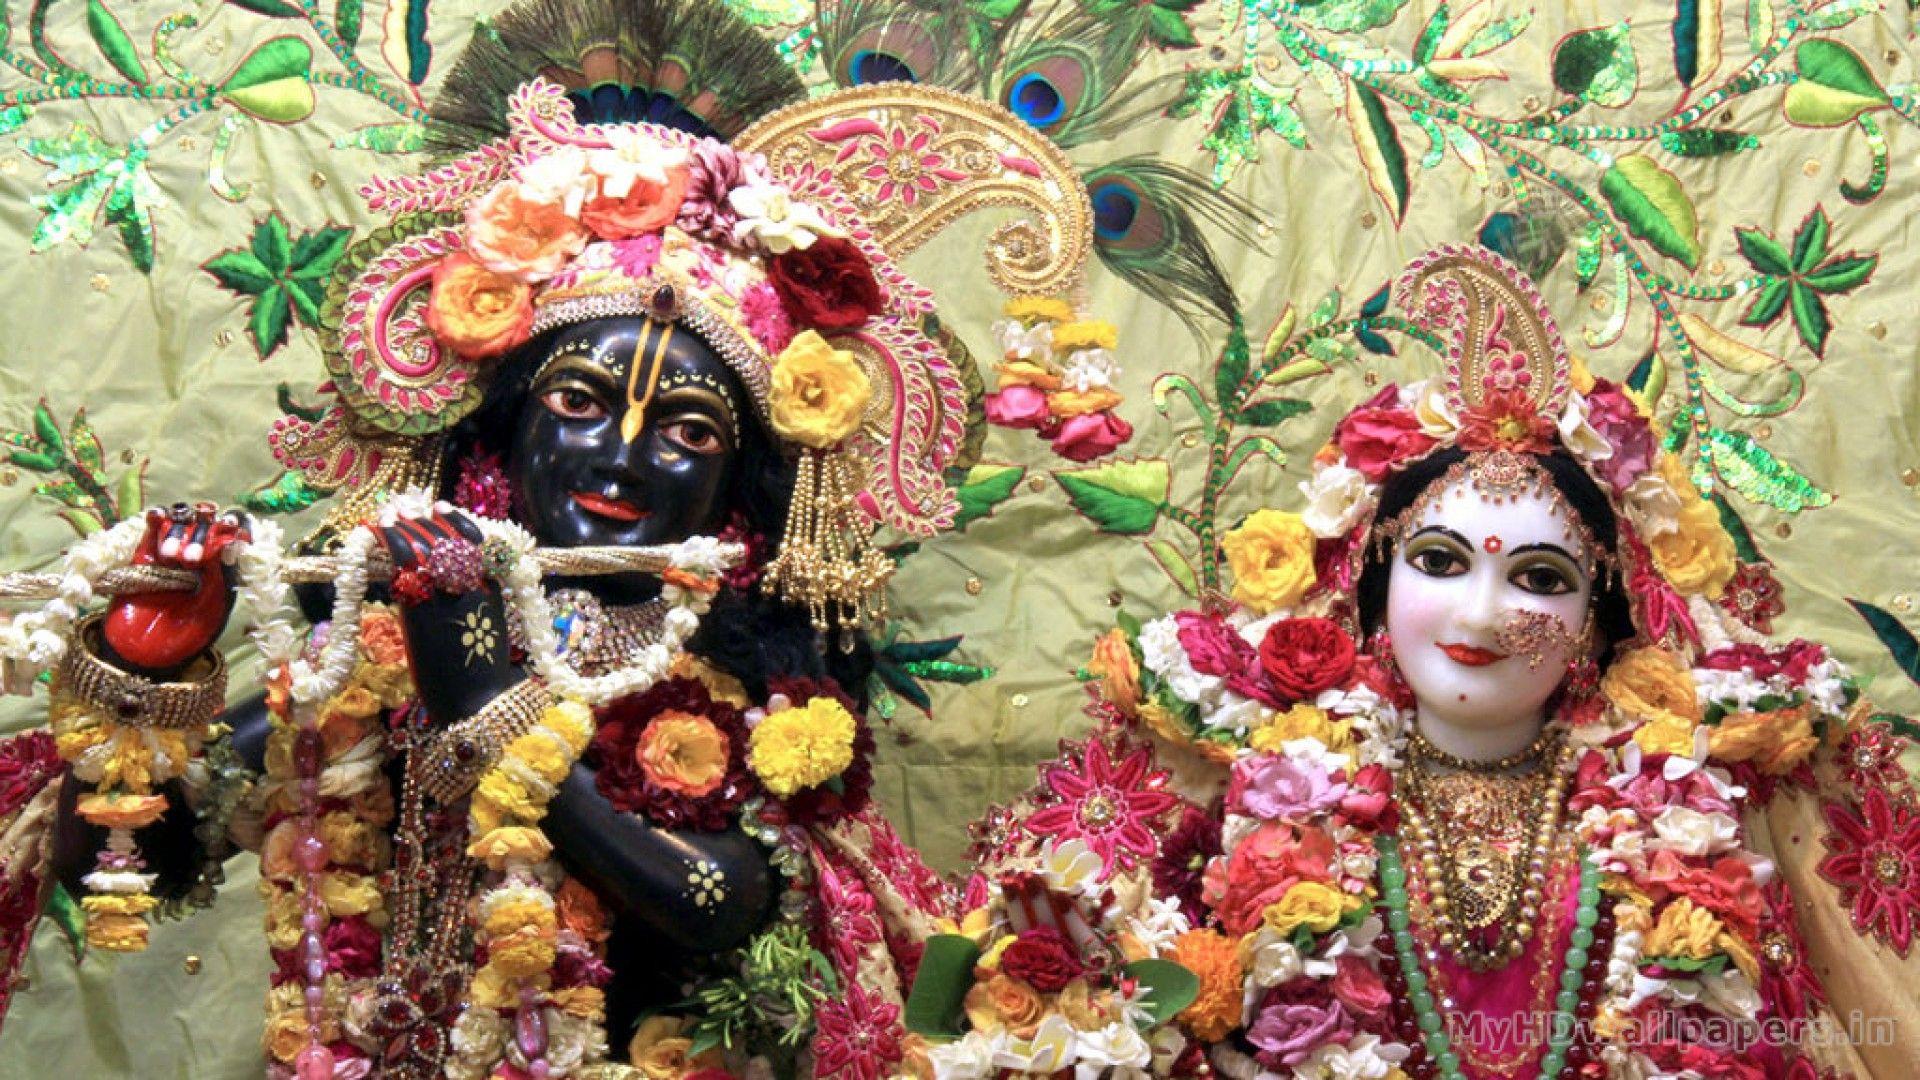 Radha Krishna Wallpaper For Pc Hd Wallpapers Krishna Wallpaper Radha Krishna Wallpaper Iskcon Vrindavan